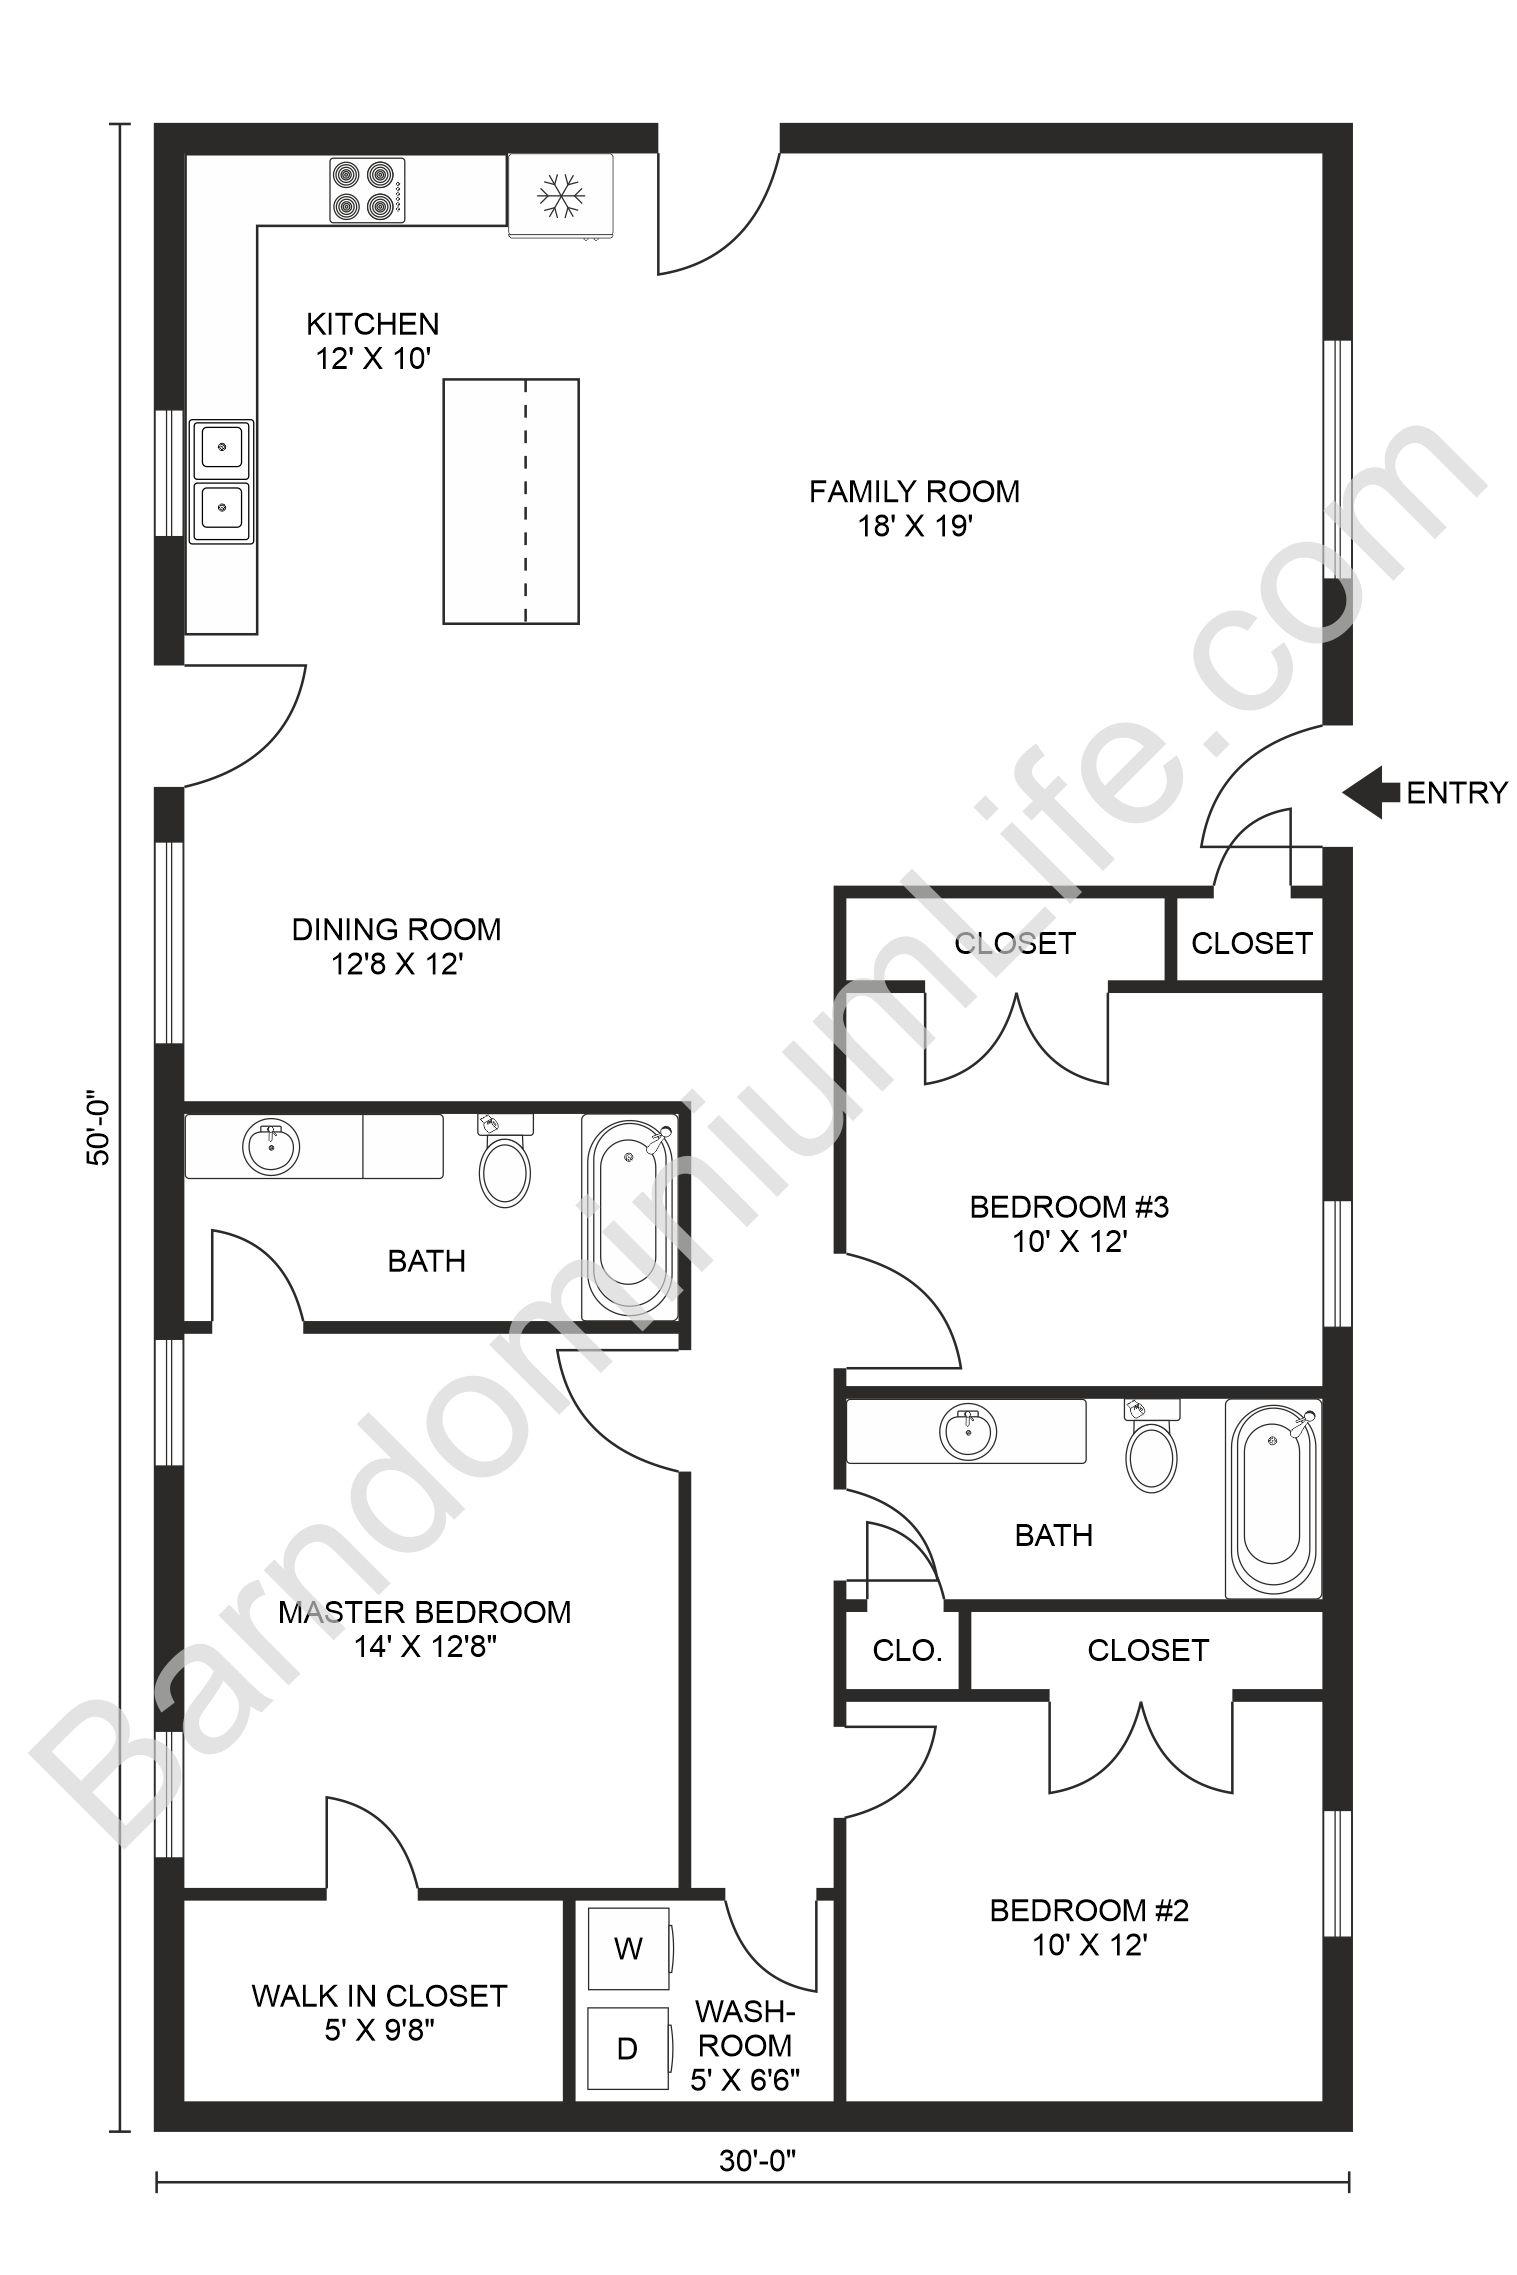 Stunning 3 Bedroom Barndominium Floor Plans In 2020 Barndominium Floor Plans Simple Floor Plans Cabin Floor Plans